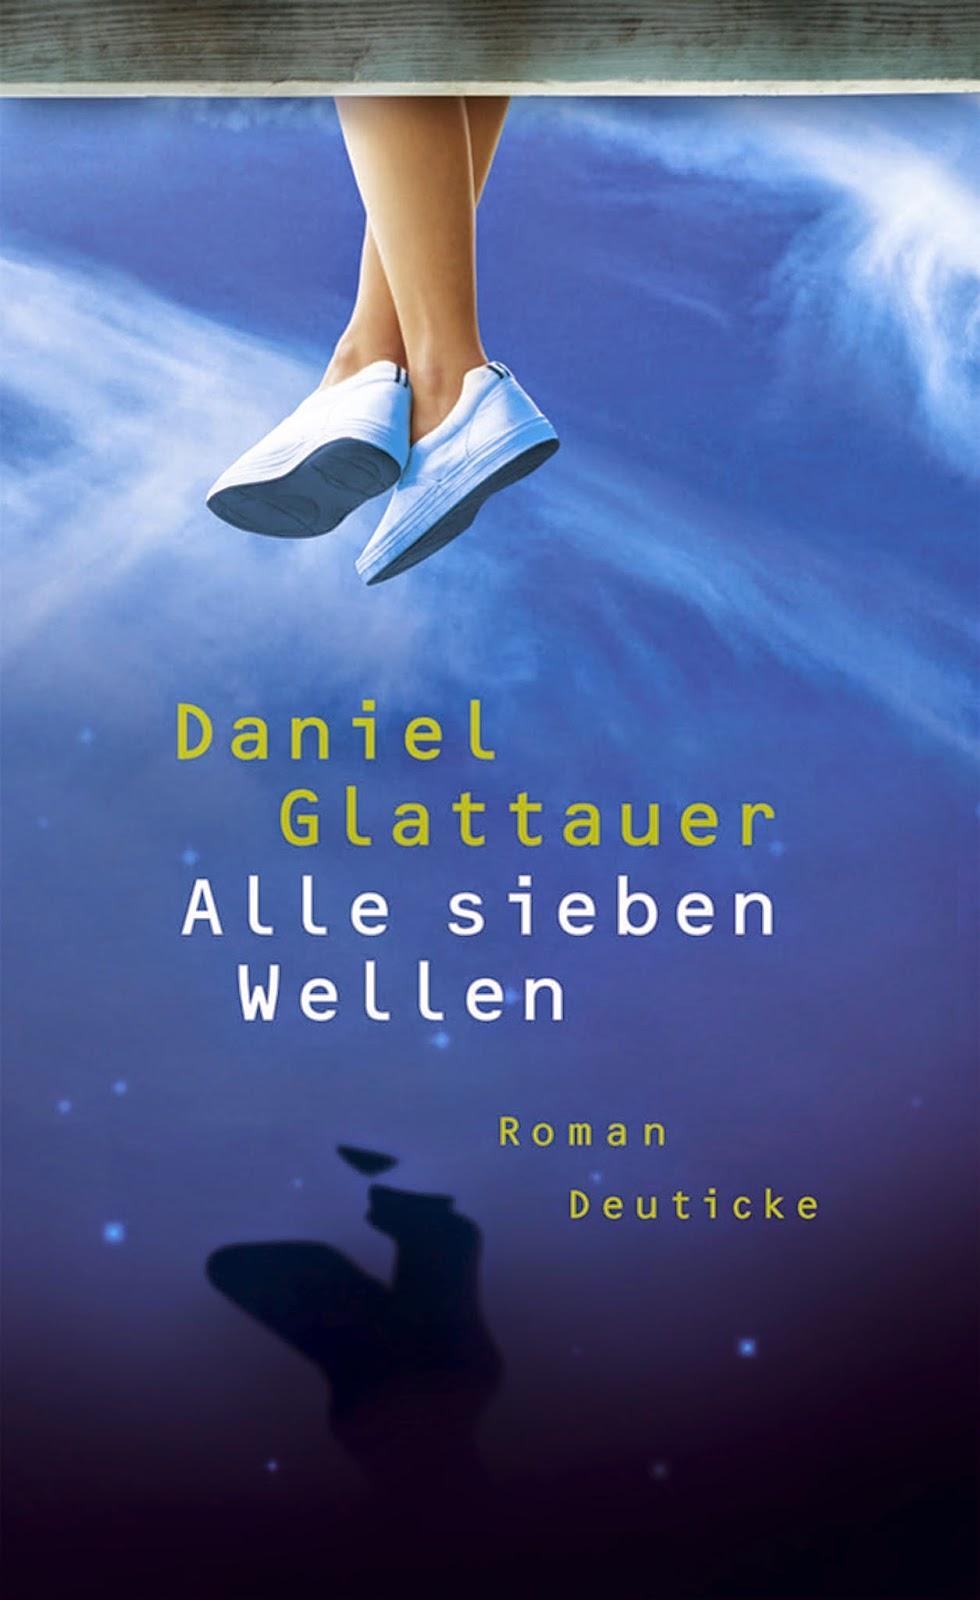 http://www.hanser-literaturverlage.de/buecher/buch.html?isbn=978-3-552-06093-7